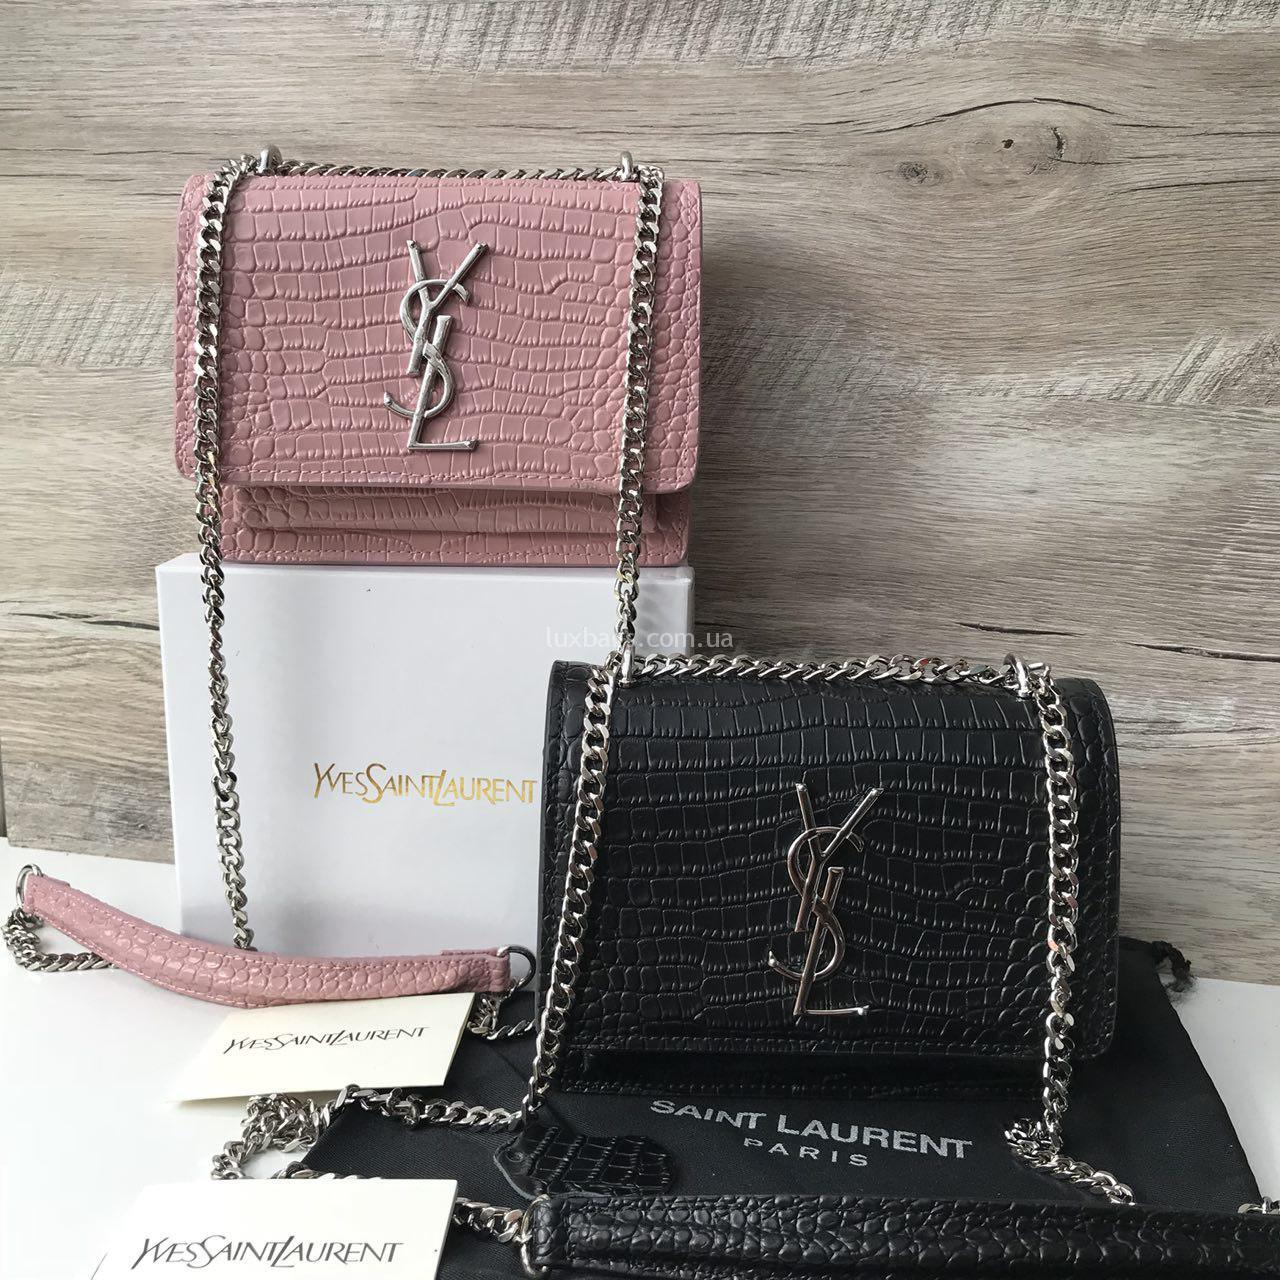 9f9077d8eb44 ... Ysl. 🔍. женские маленькие сумки ив сен лоран брендовые реплика